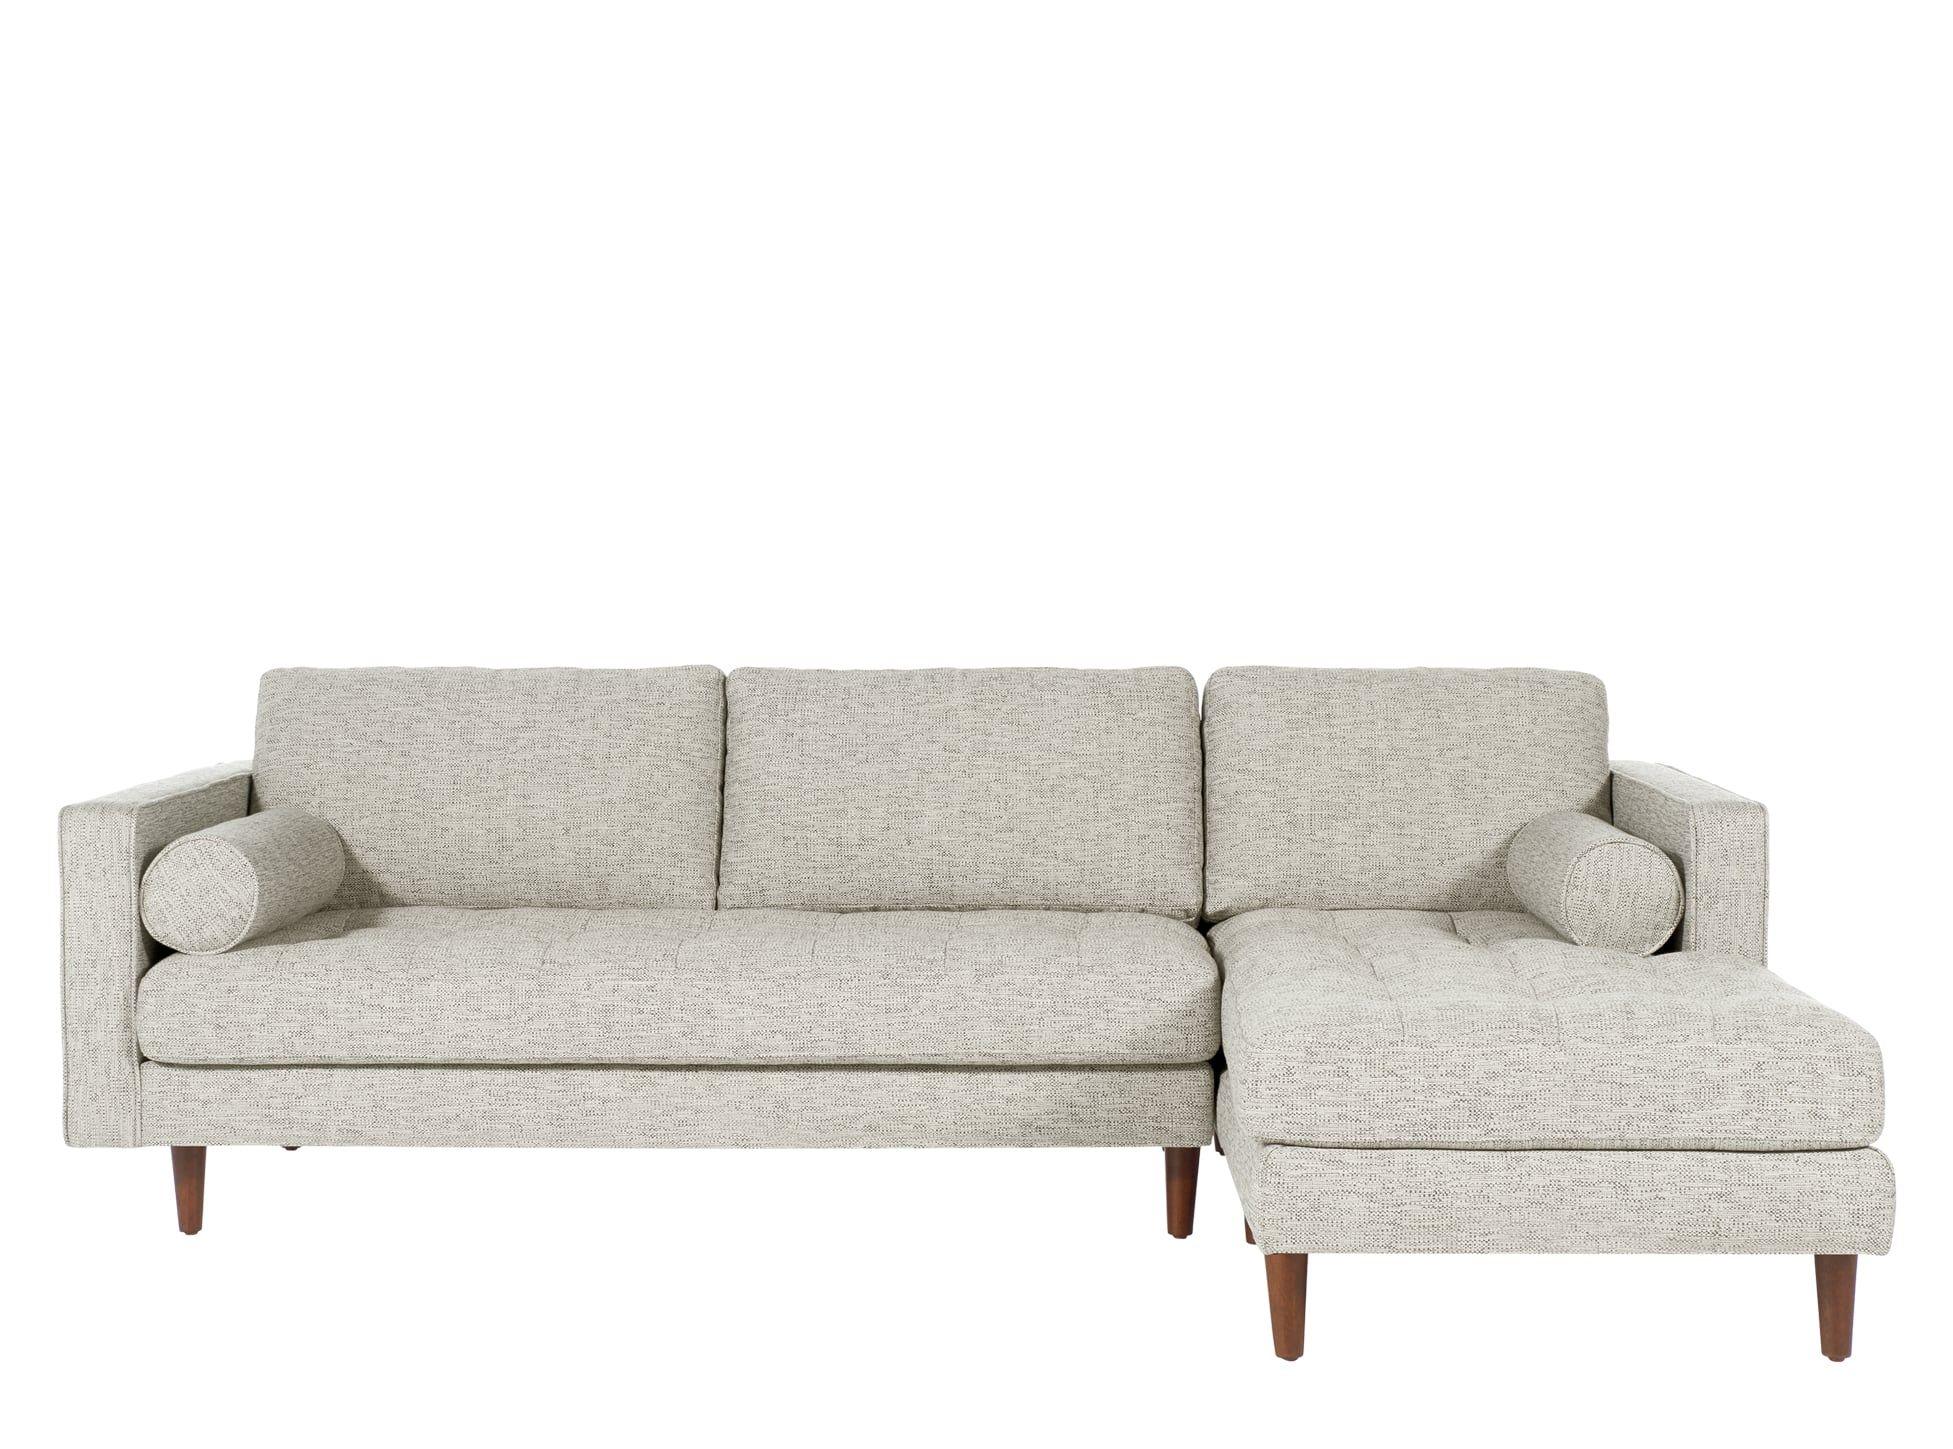 Made Grey Basketweave Sofa Corner Sofa Sofa Black Sofa